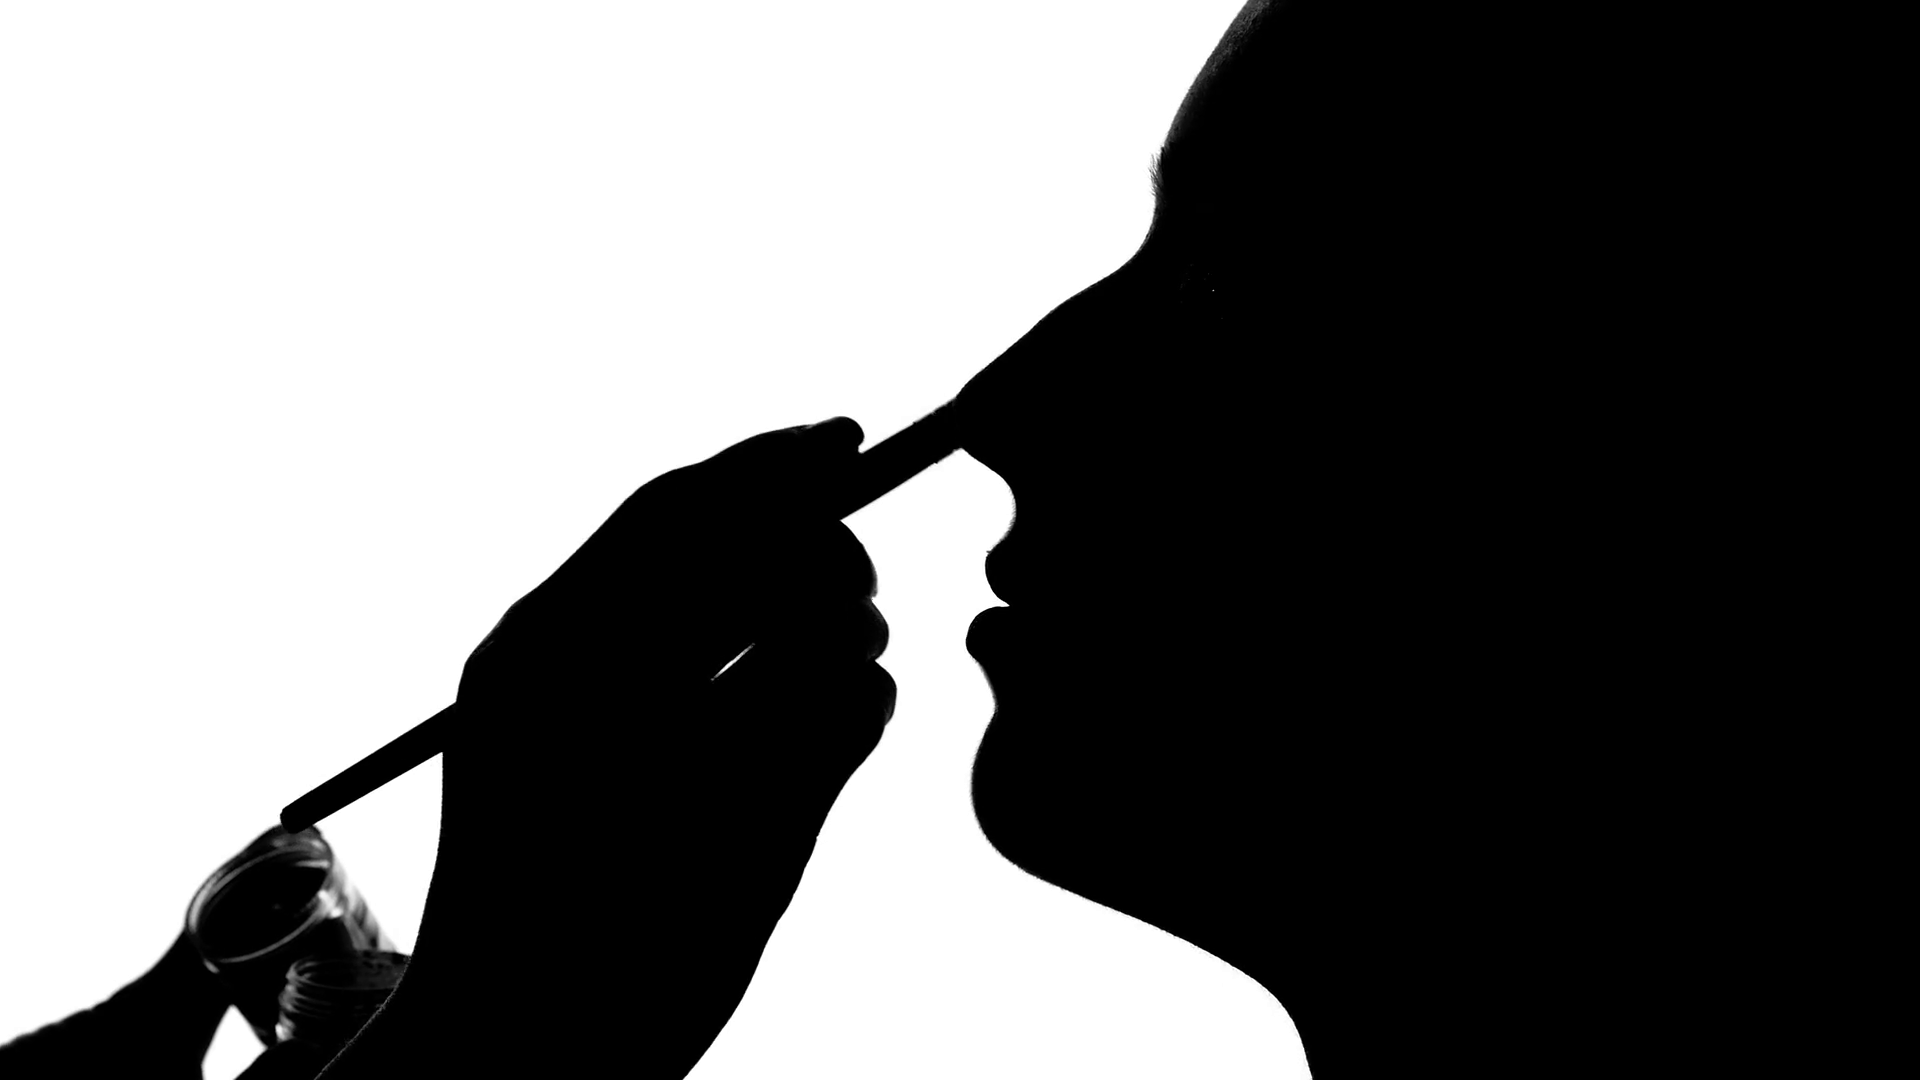 1920x1080 Eye Makeup Woman Applying Eyeshadow Powder, Close Up, Silhouette